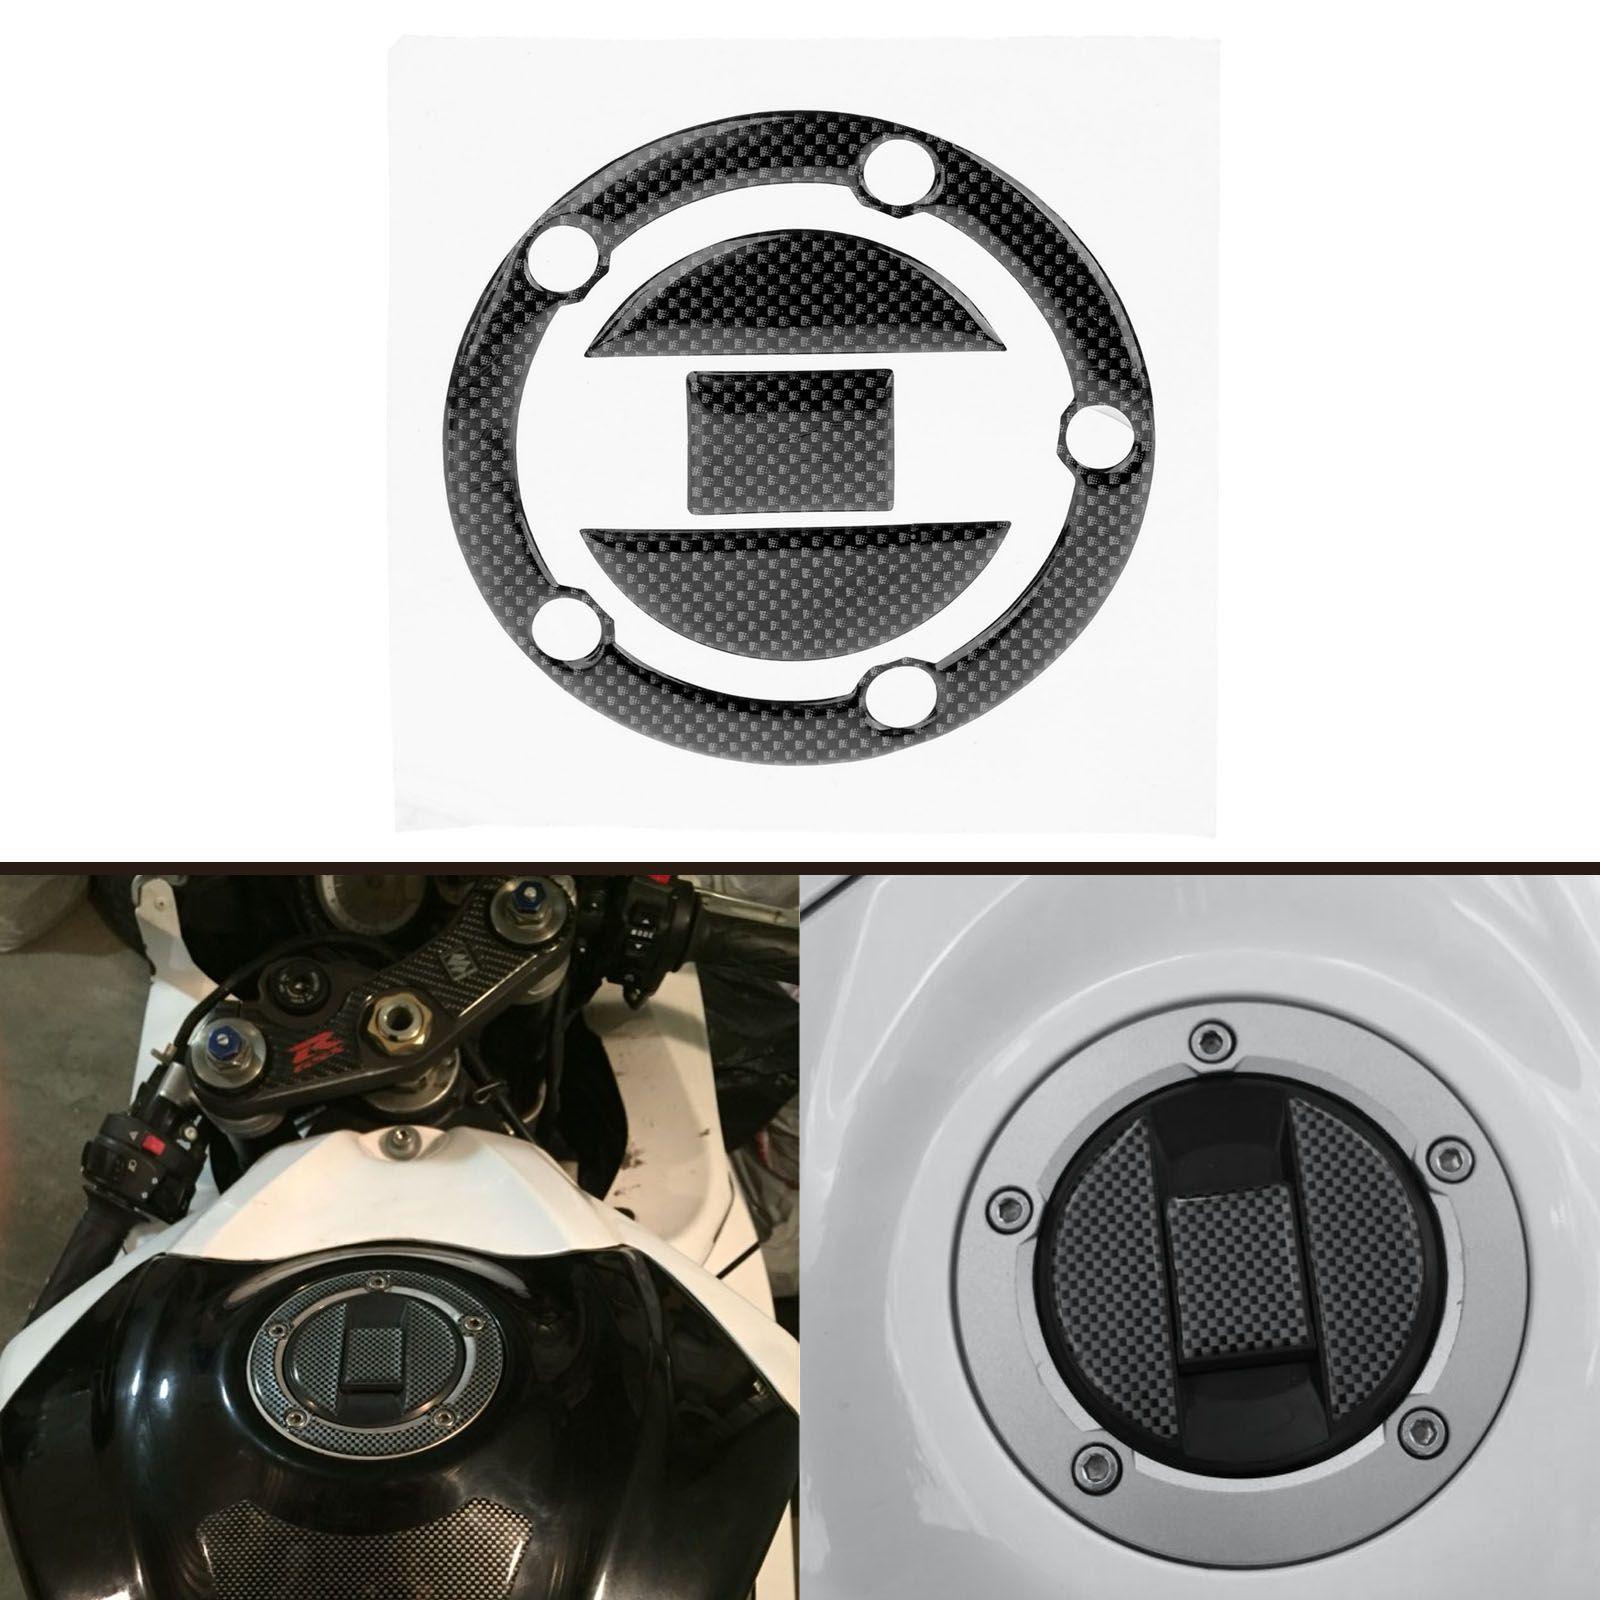 Tank Pad Protector Sticker Oil Fuel Gas Cap Decal For Suzuki Gsx R750 Gsxr1000 Sv1000s Motorcycle Decoration Motorcycle Decor Motorbike Accessories Suzuki Gsx [ 1600 x 1600 Pixel ]